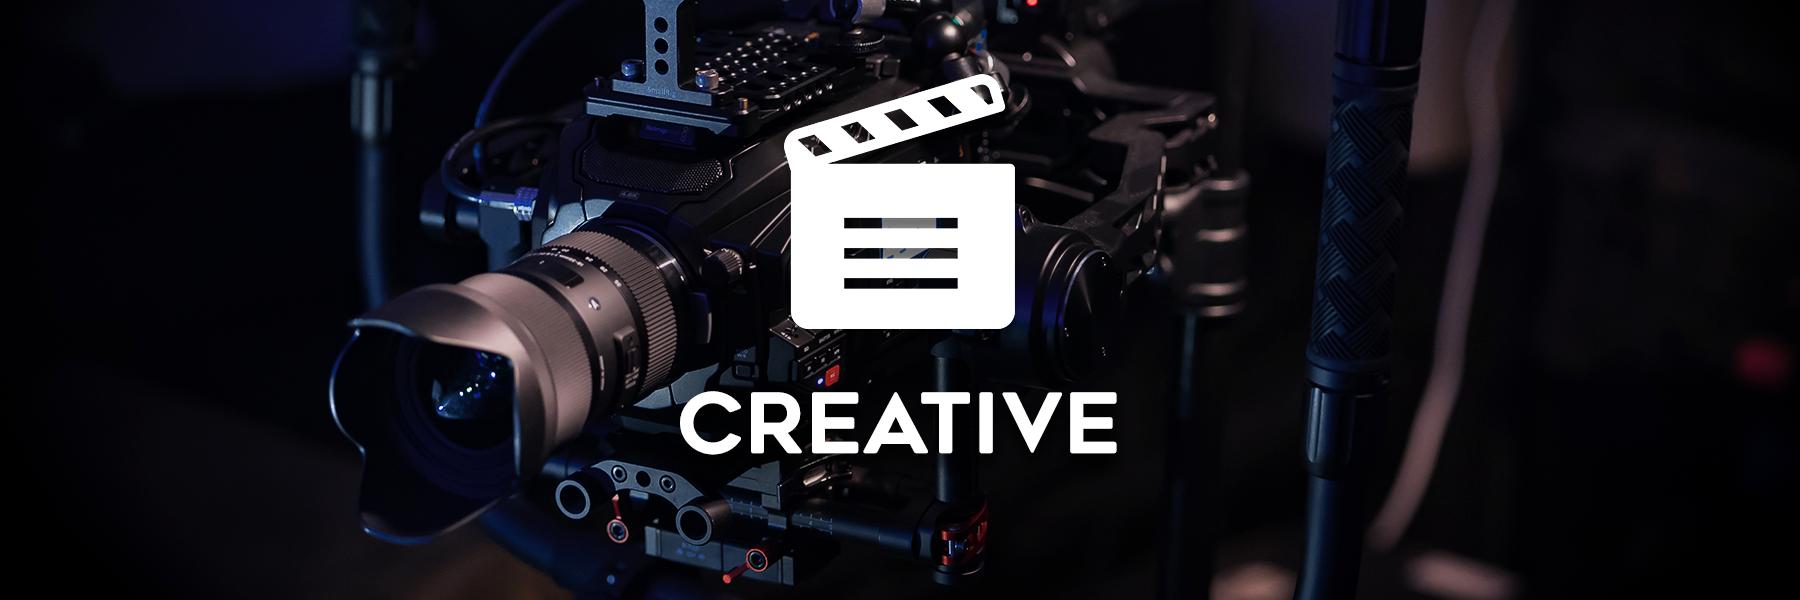 Creative Services - Music Videos, Kickstarter, Short Stories, Documentaries